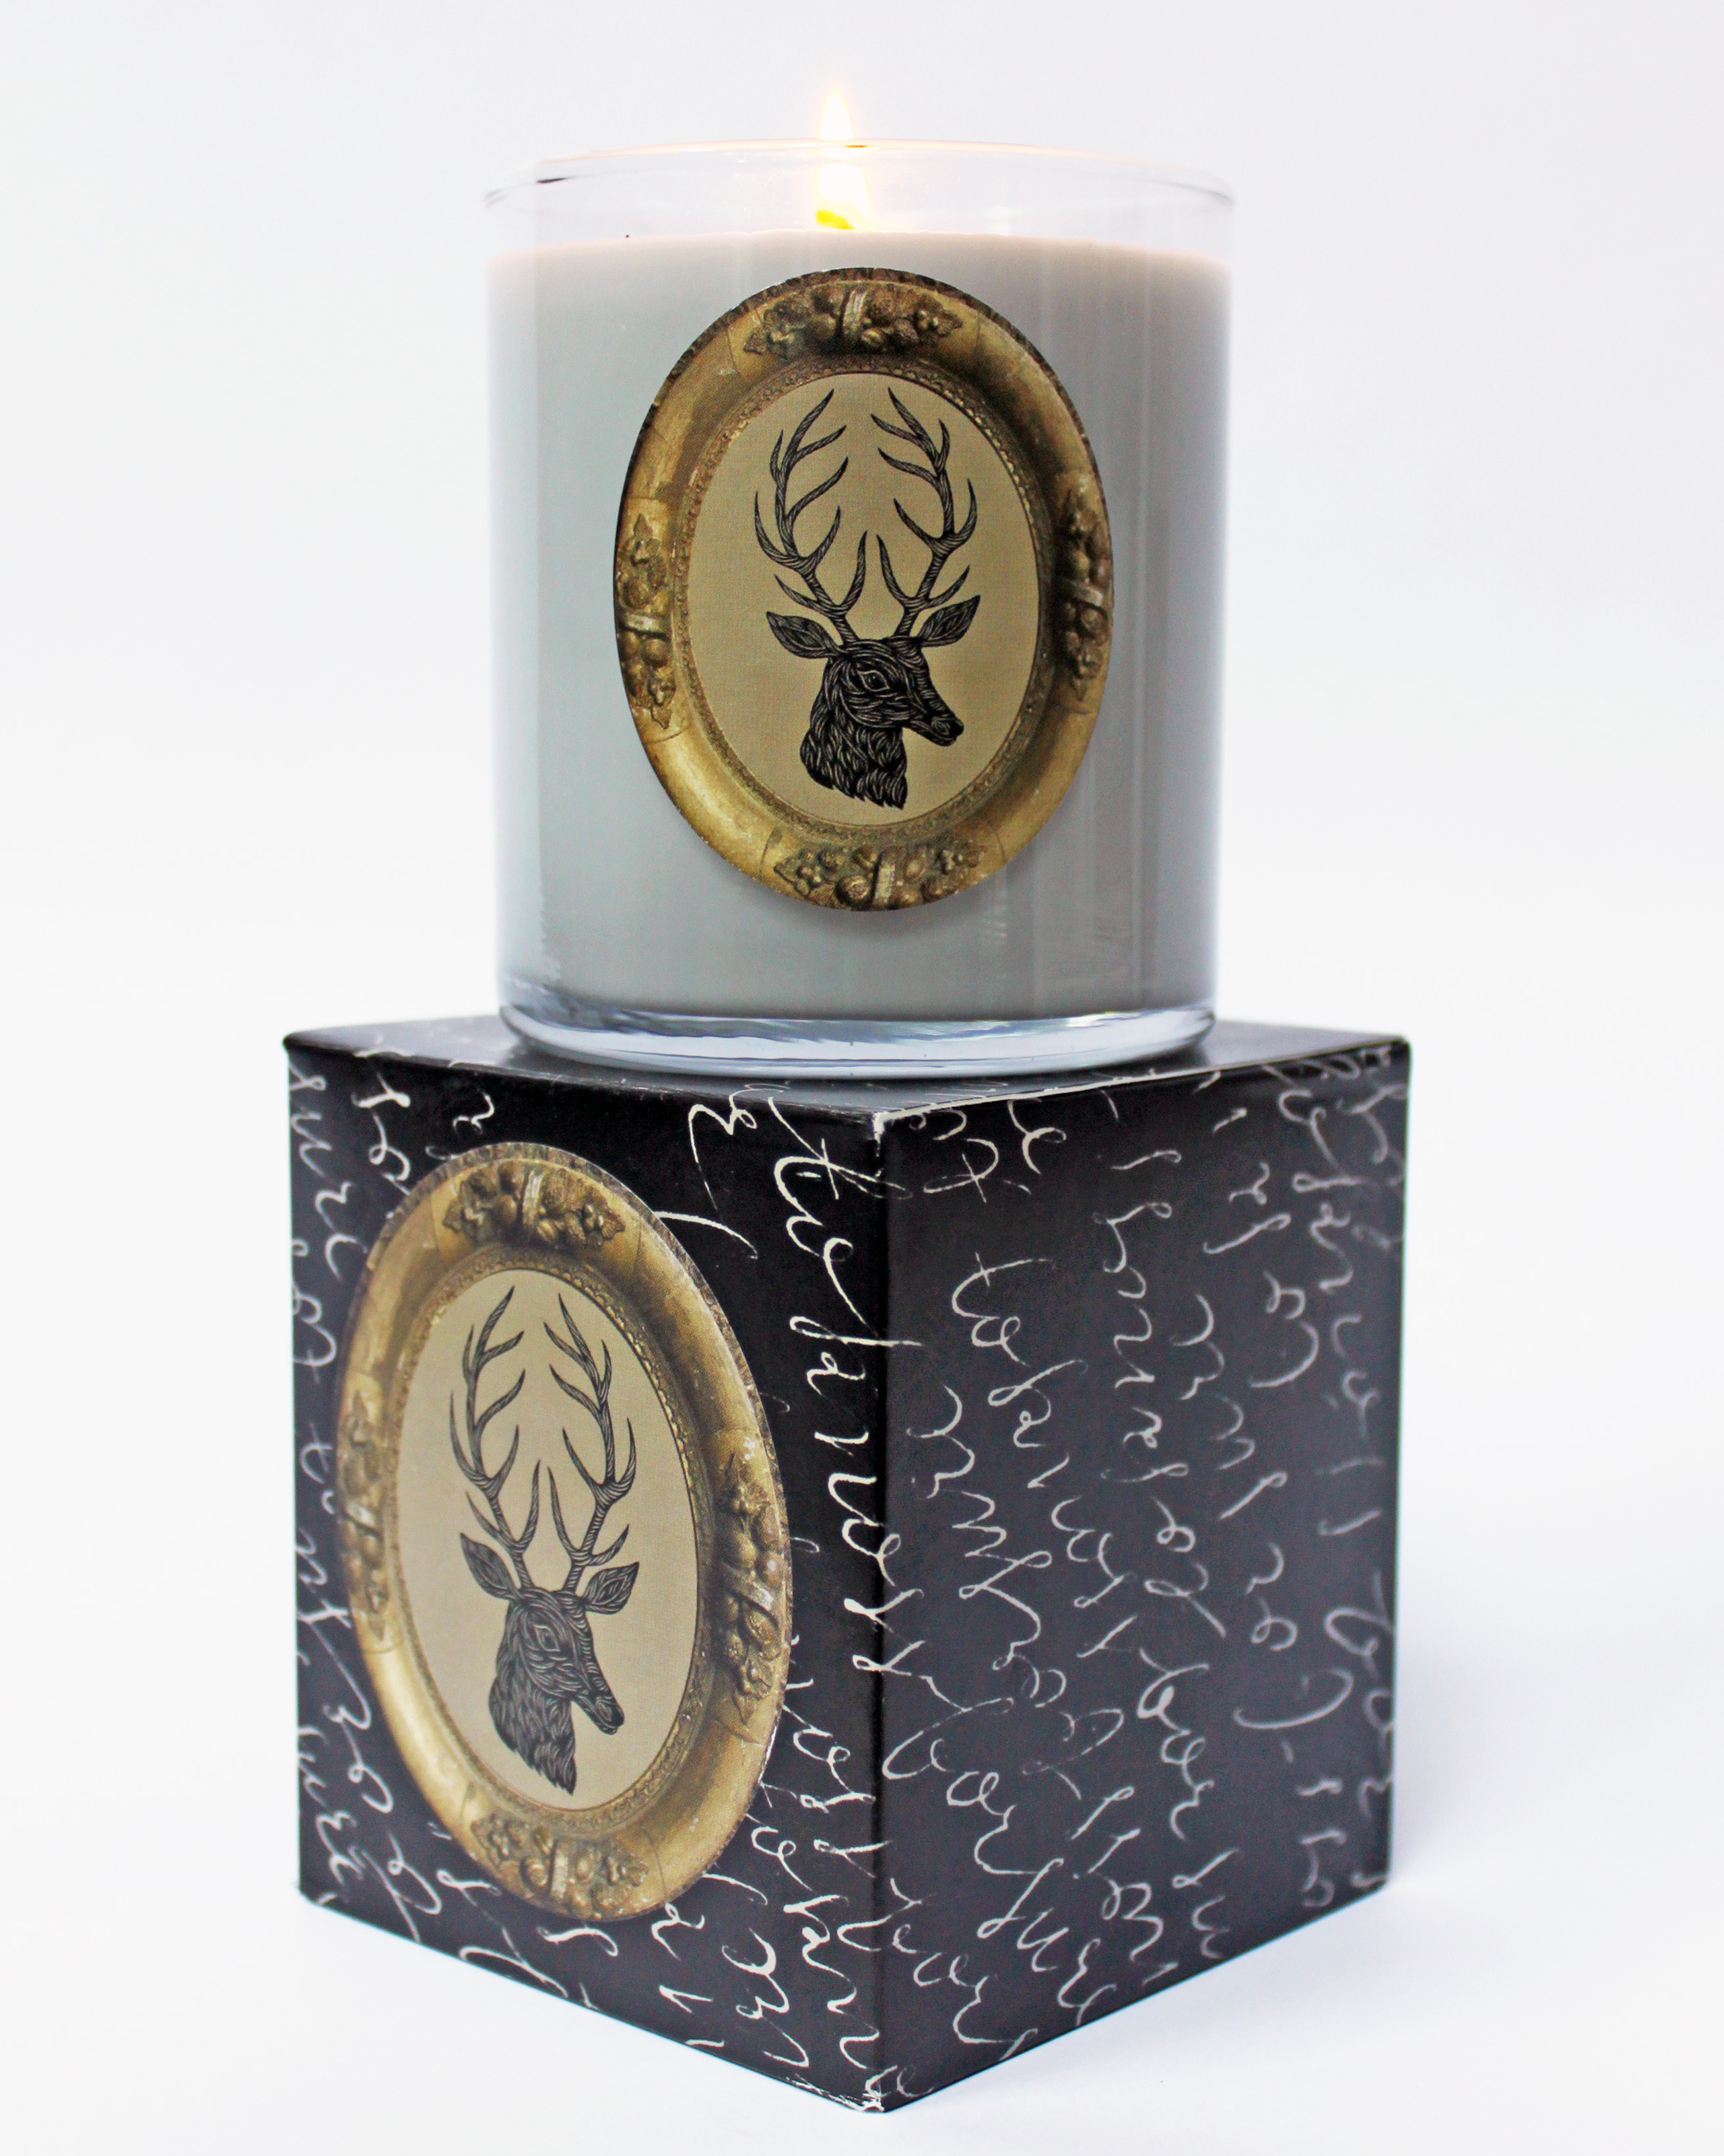 wwln-anthony-patchnyc-candle-1115.jpg